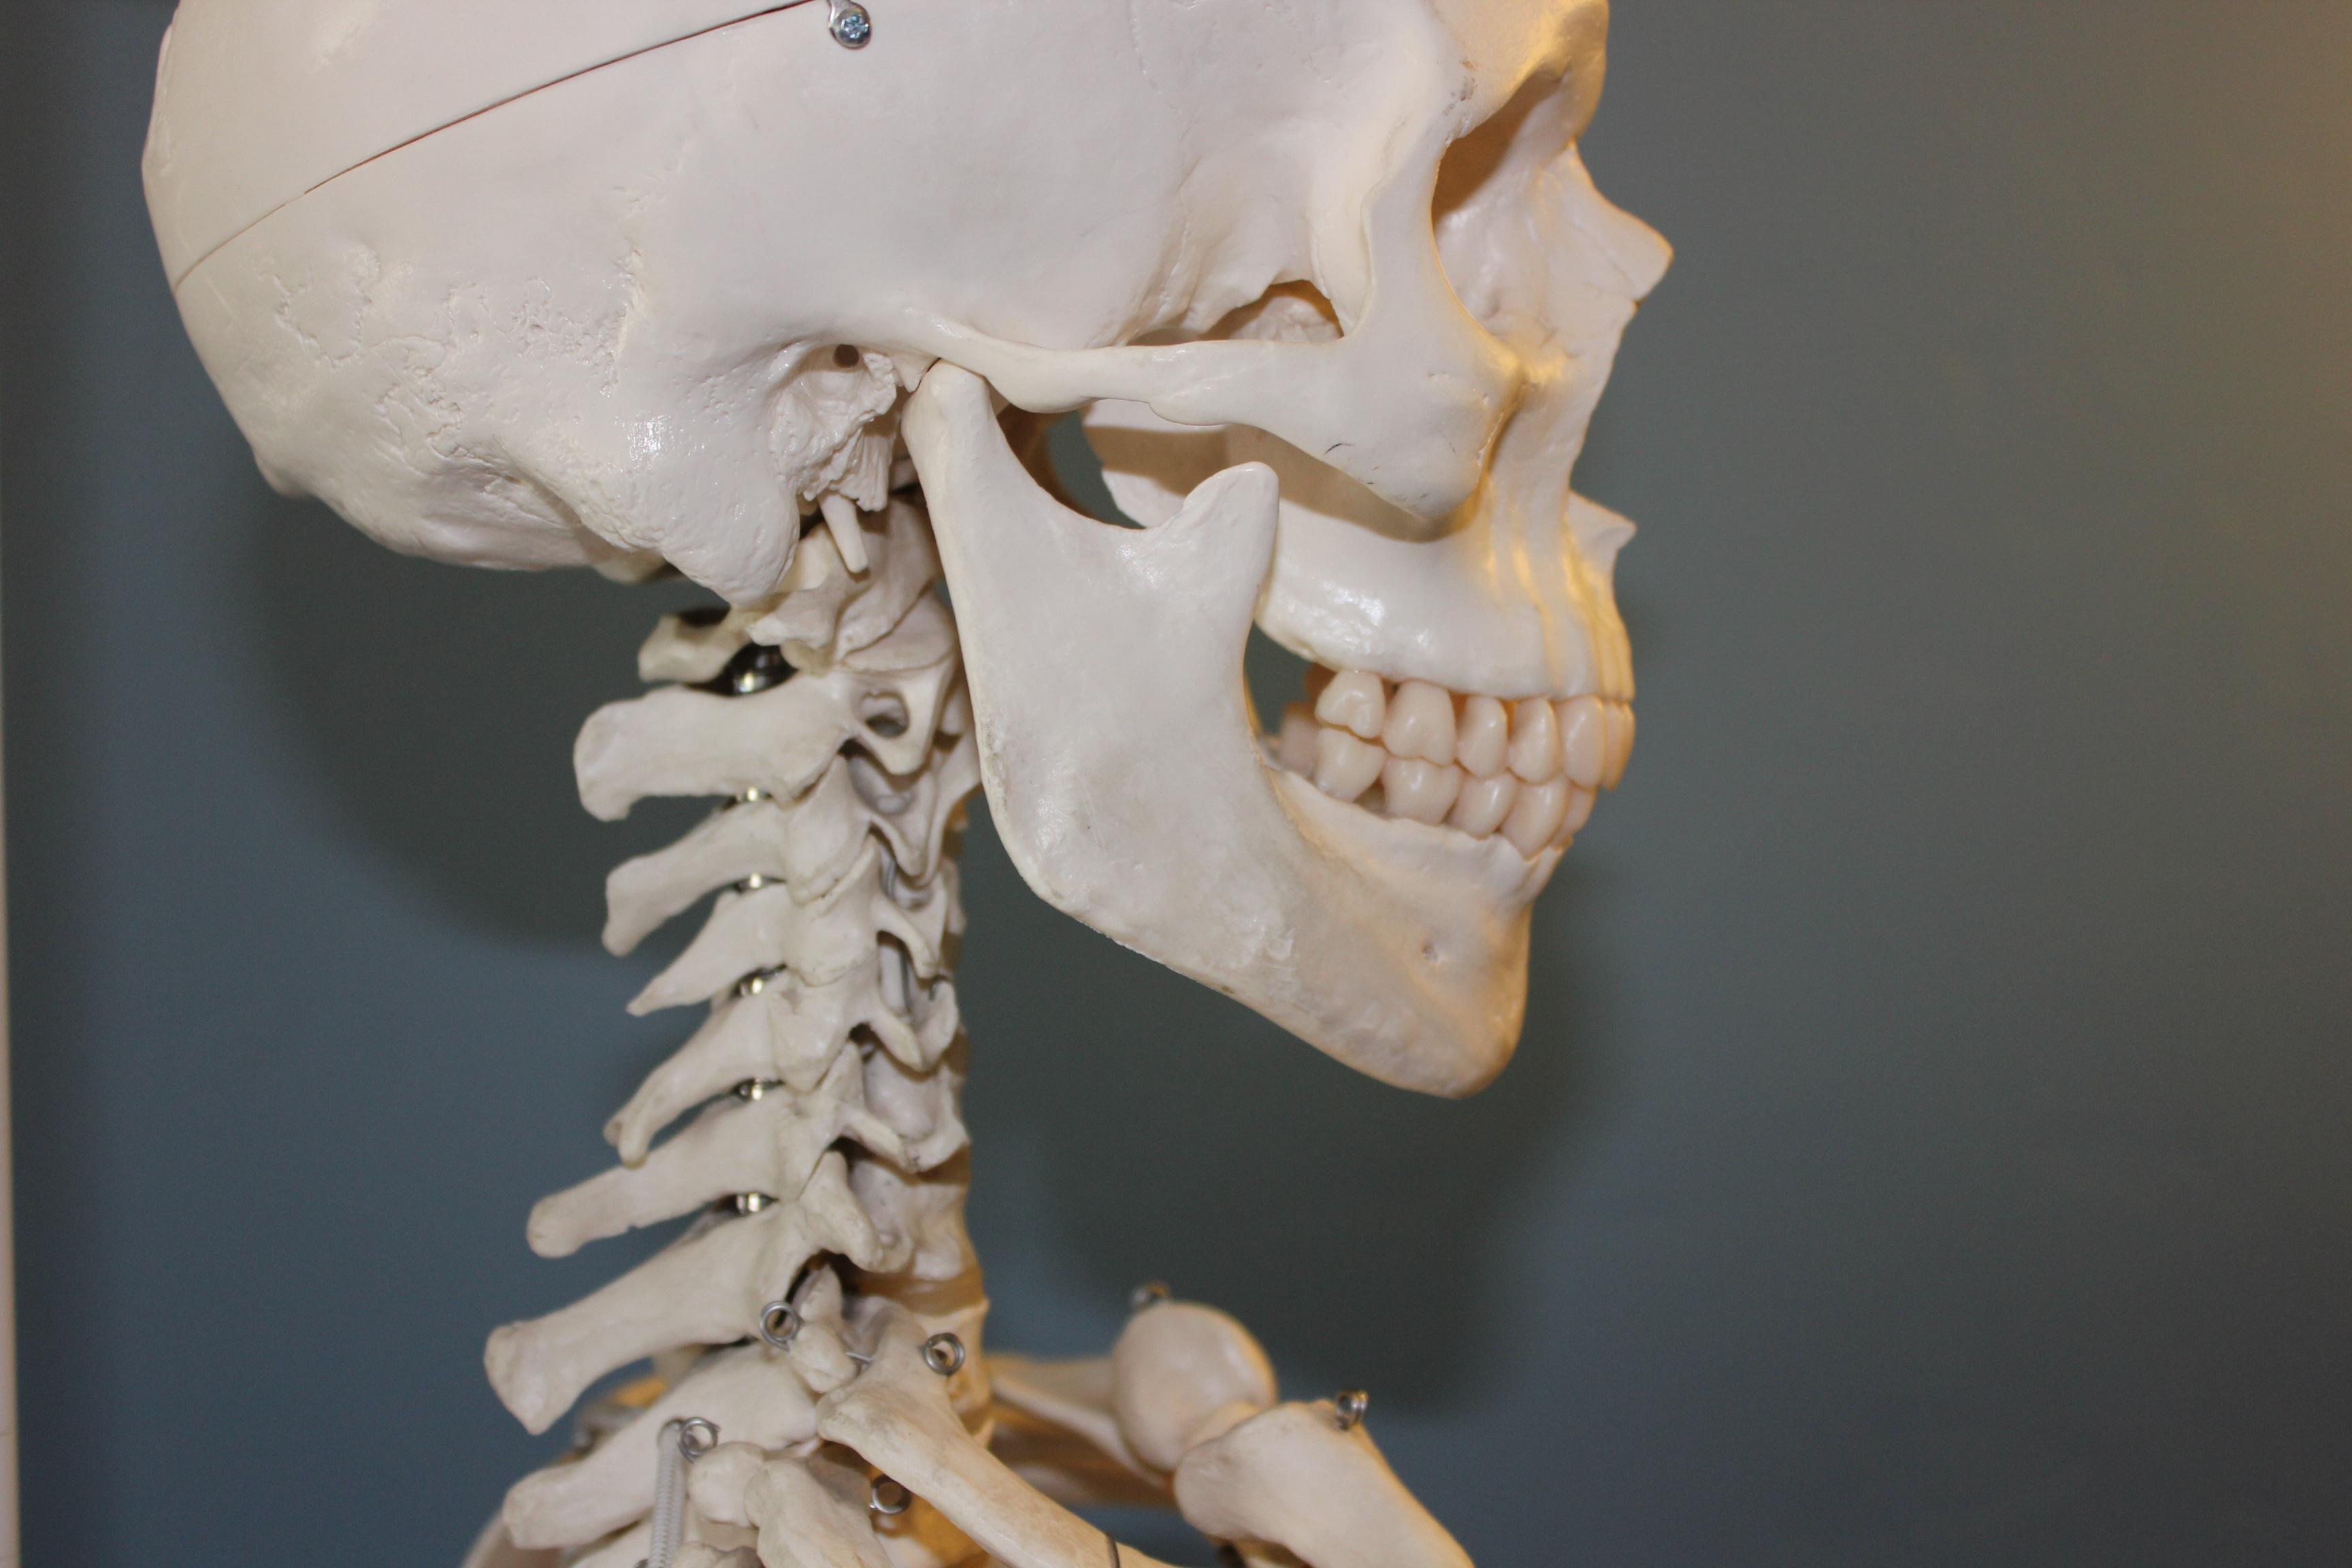 Free Images : statue, human, skull, bone, close up, face